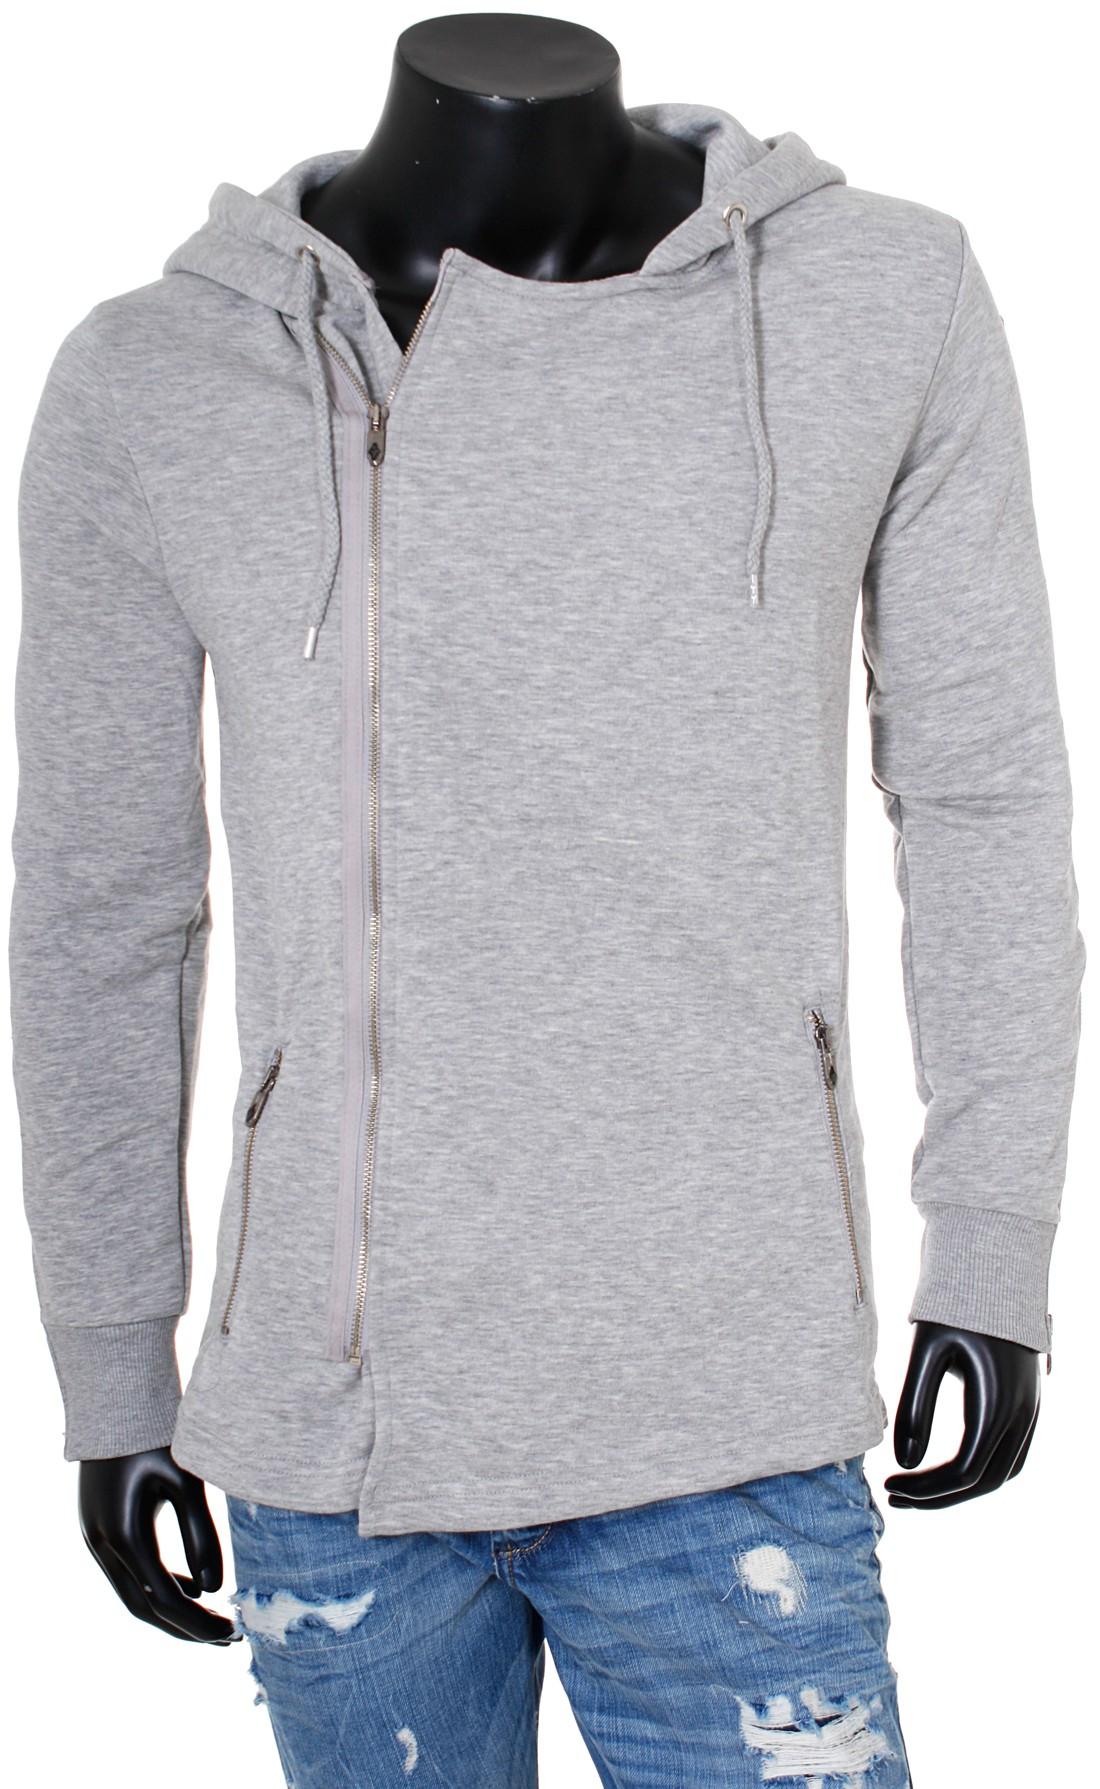 rerock herren sweatjacke mit kapuze asymmetrisch langer schnitt hoodie slimfit ebay. Black Bedroom Furniture Sets. Home Design Ideas